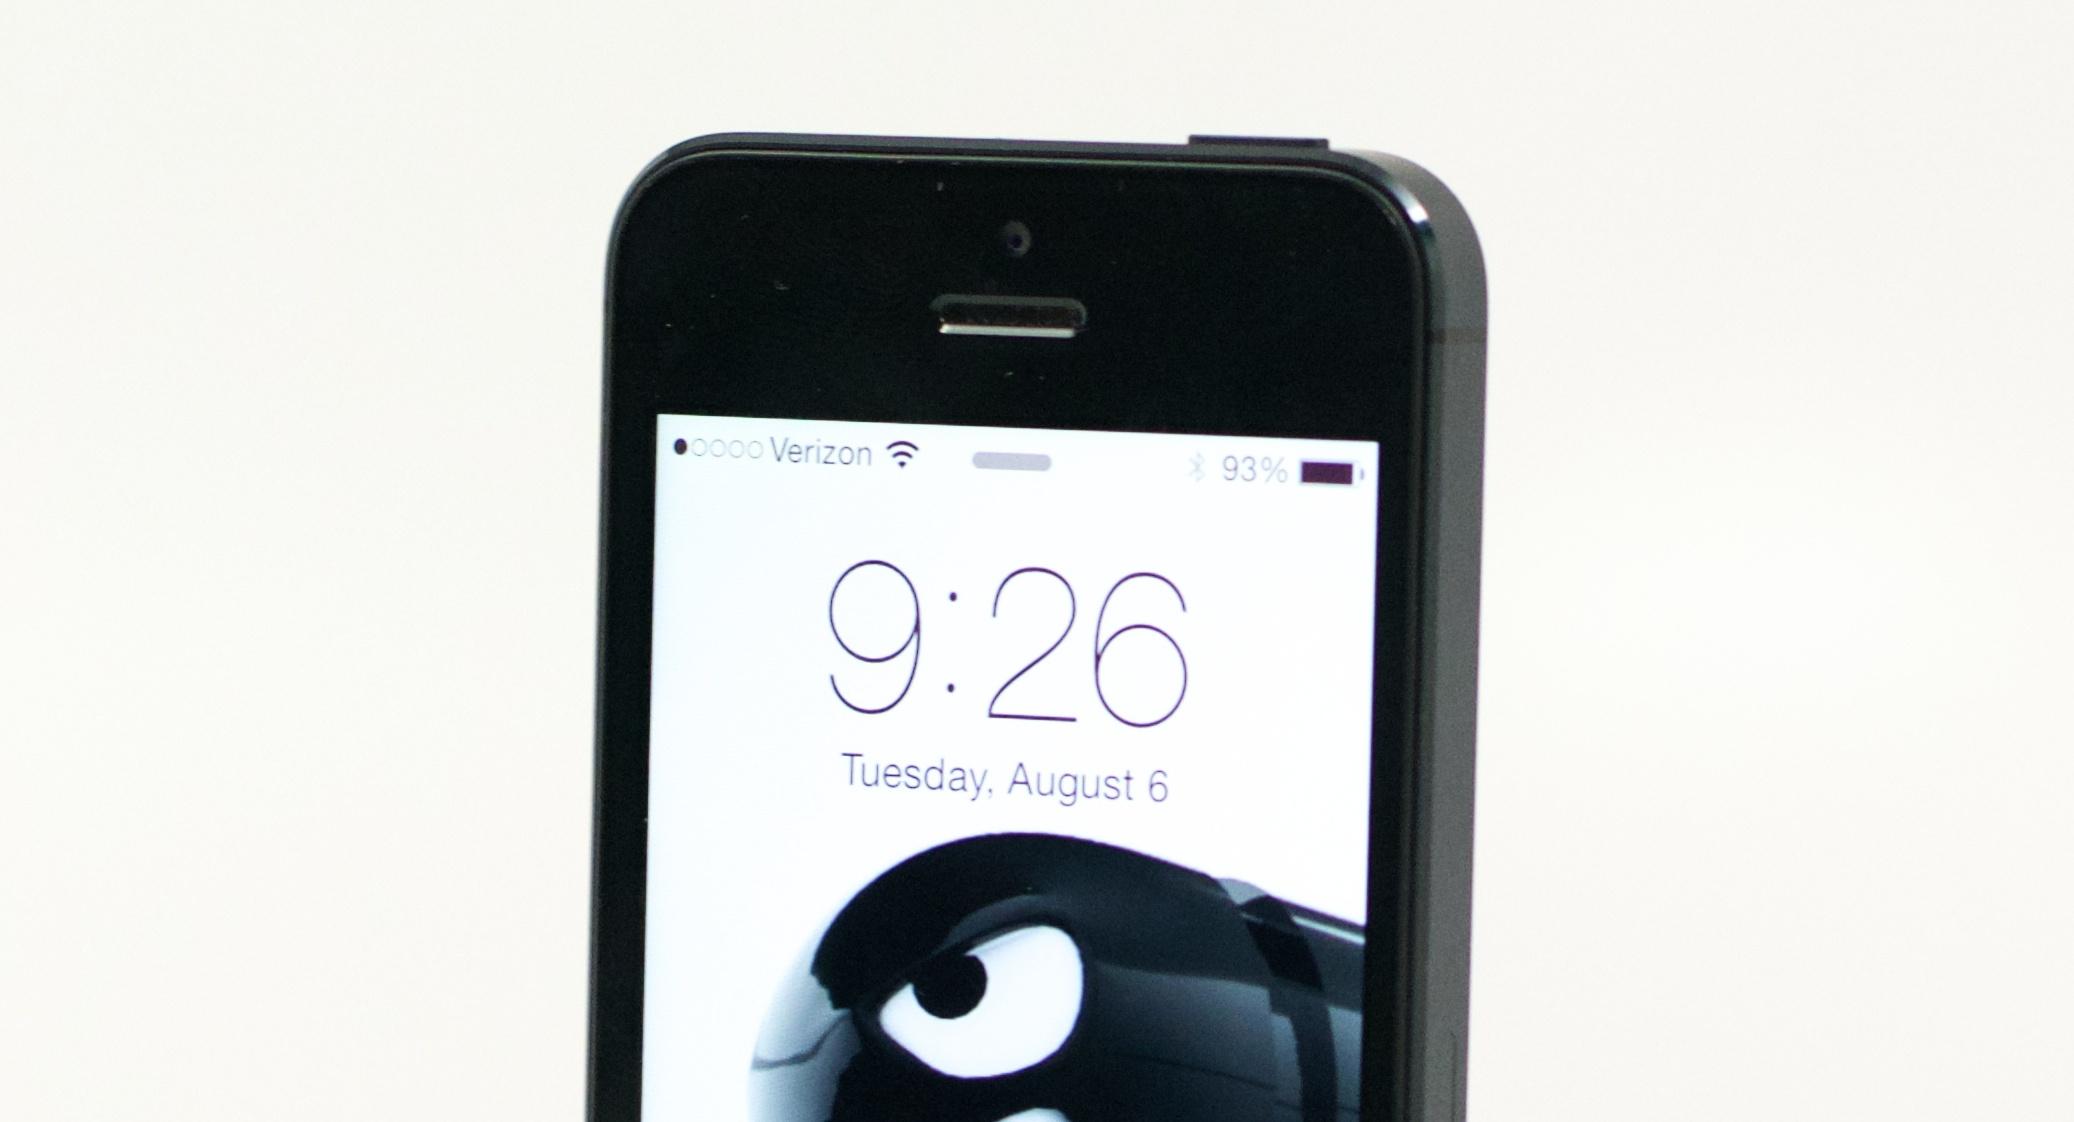 Verizon Talk And Surf Iphone